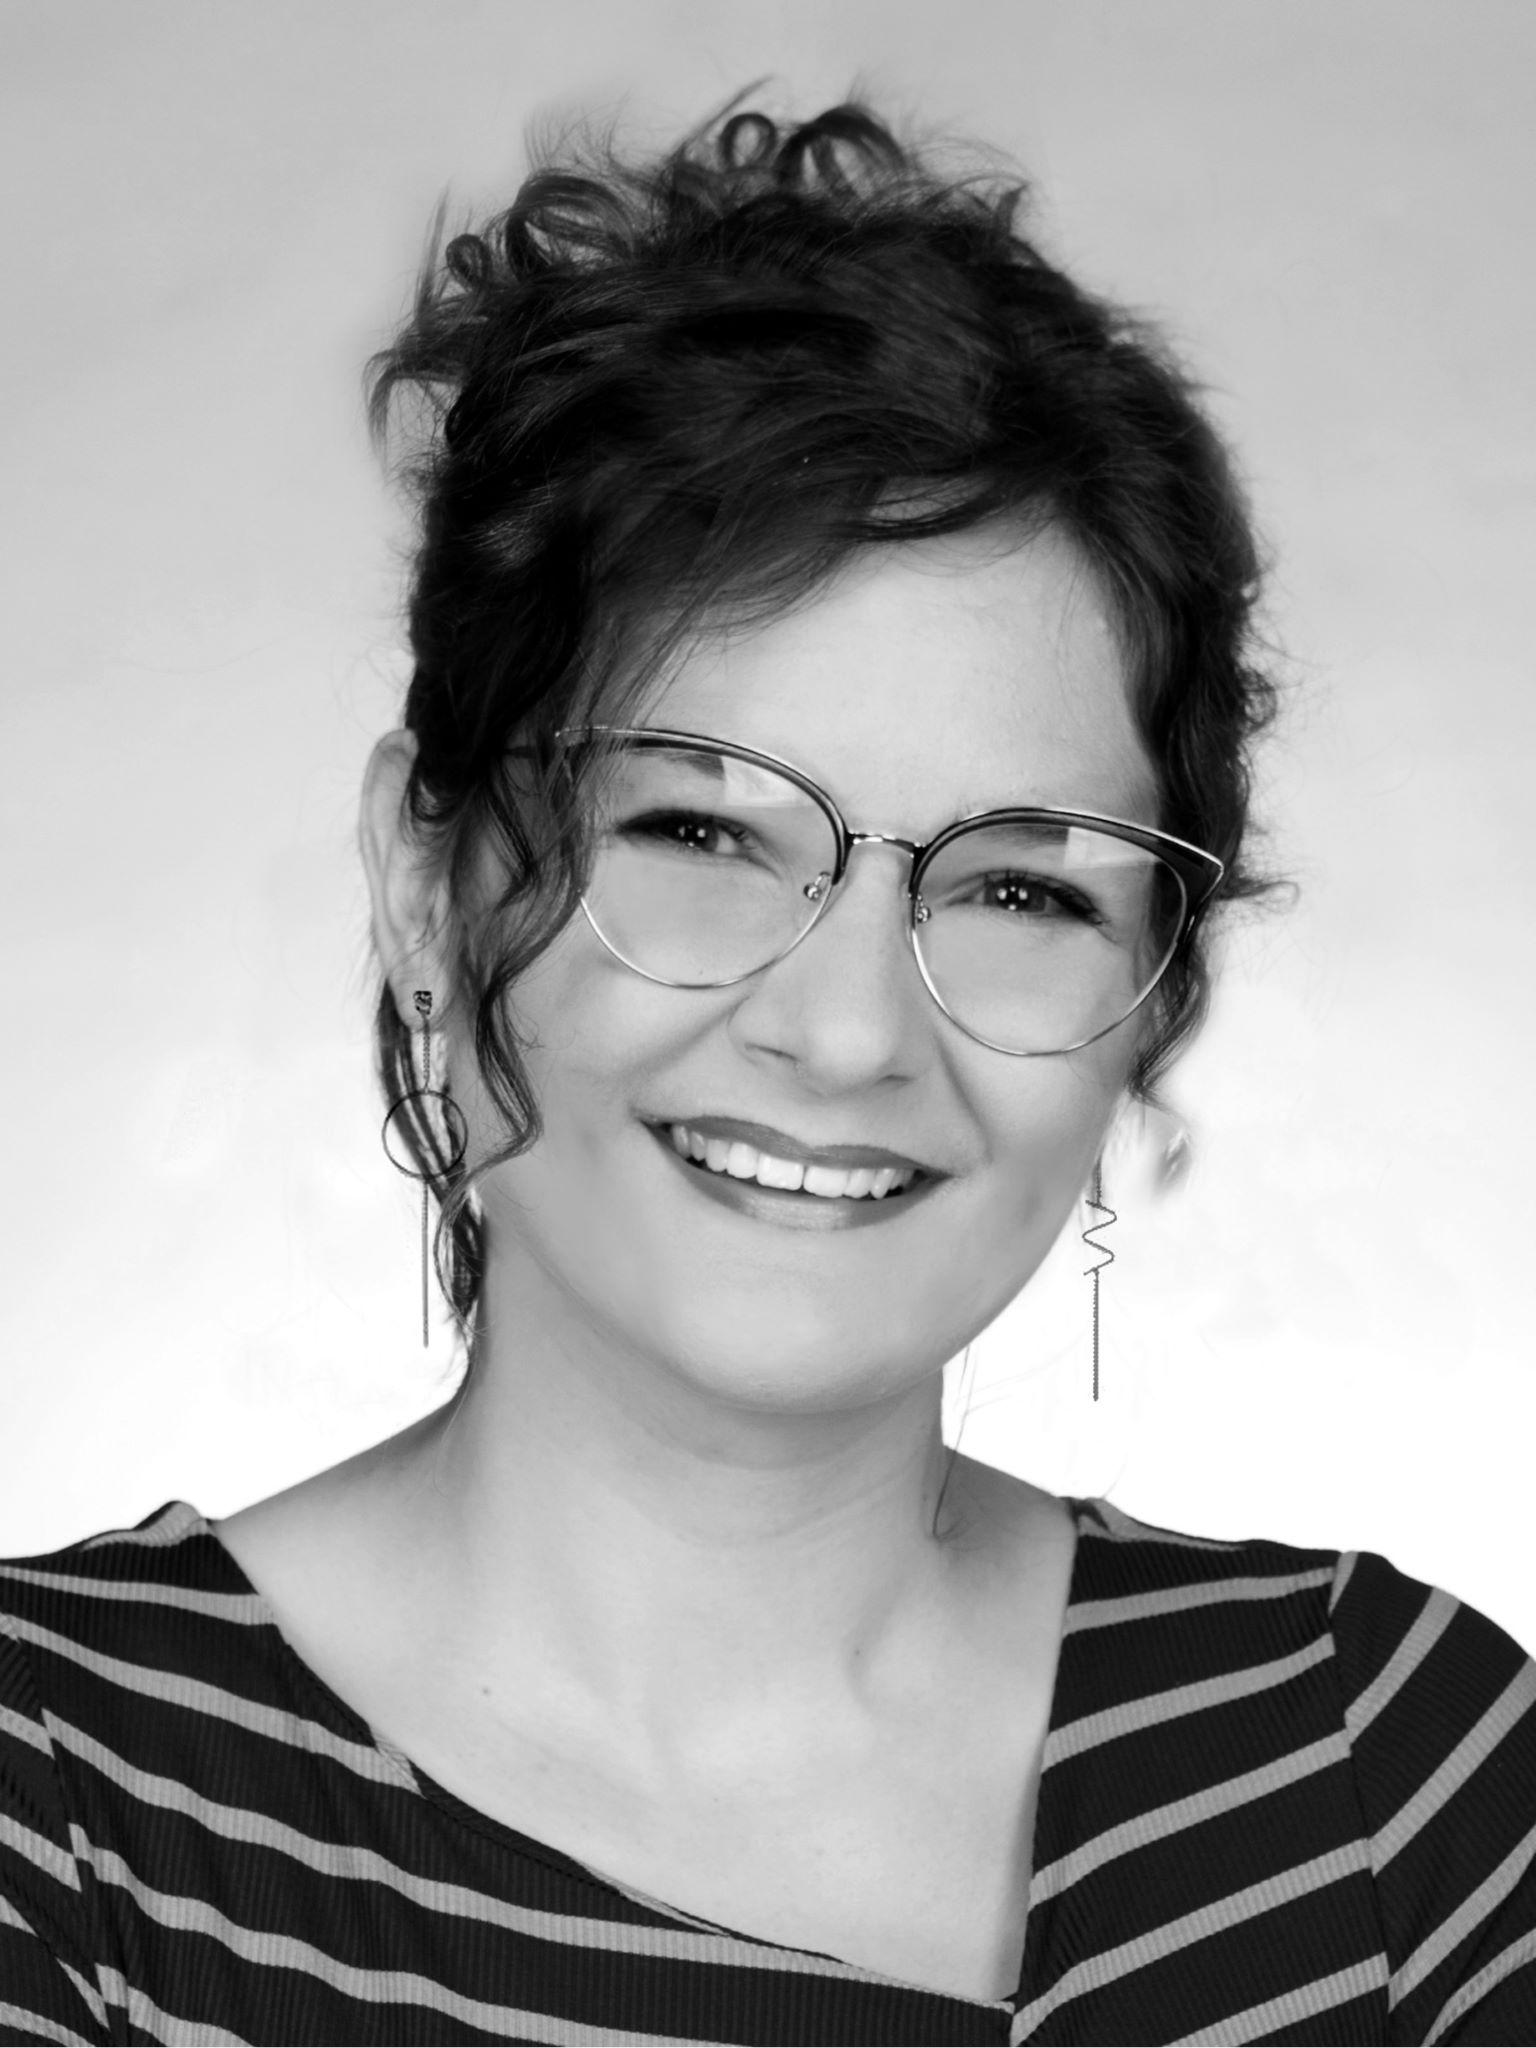 Anna Kuczwalska